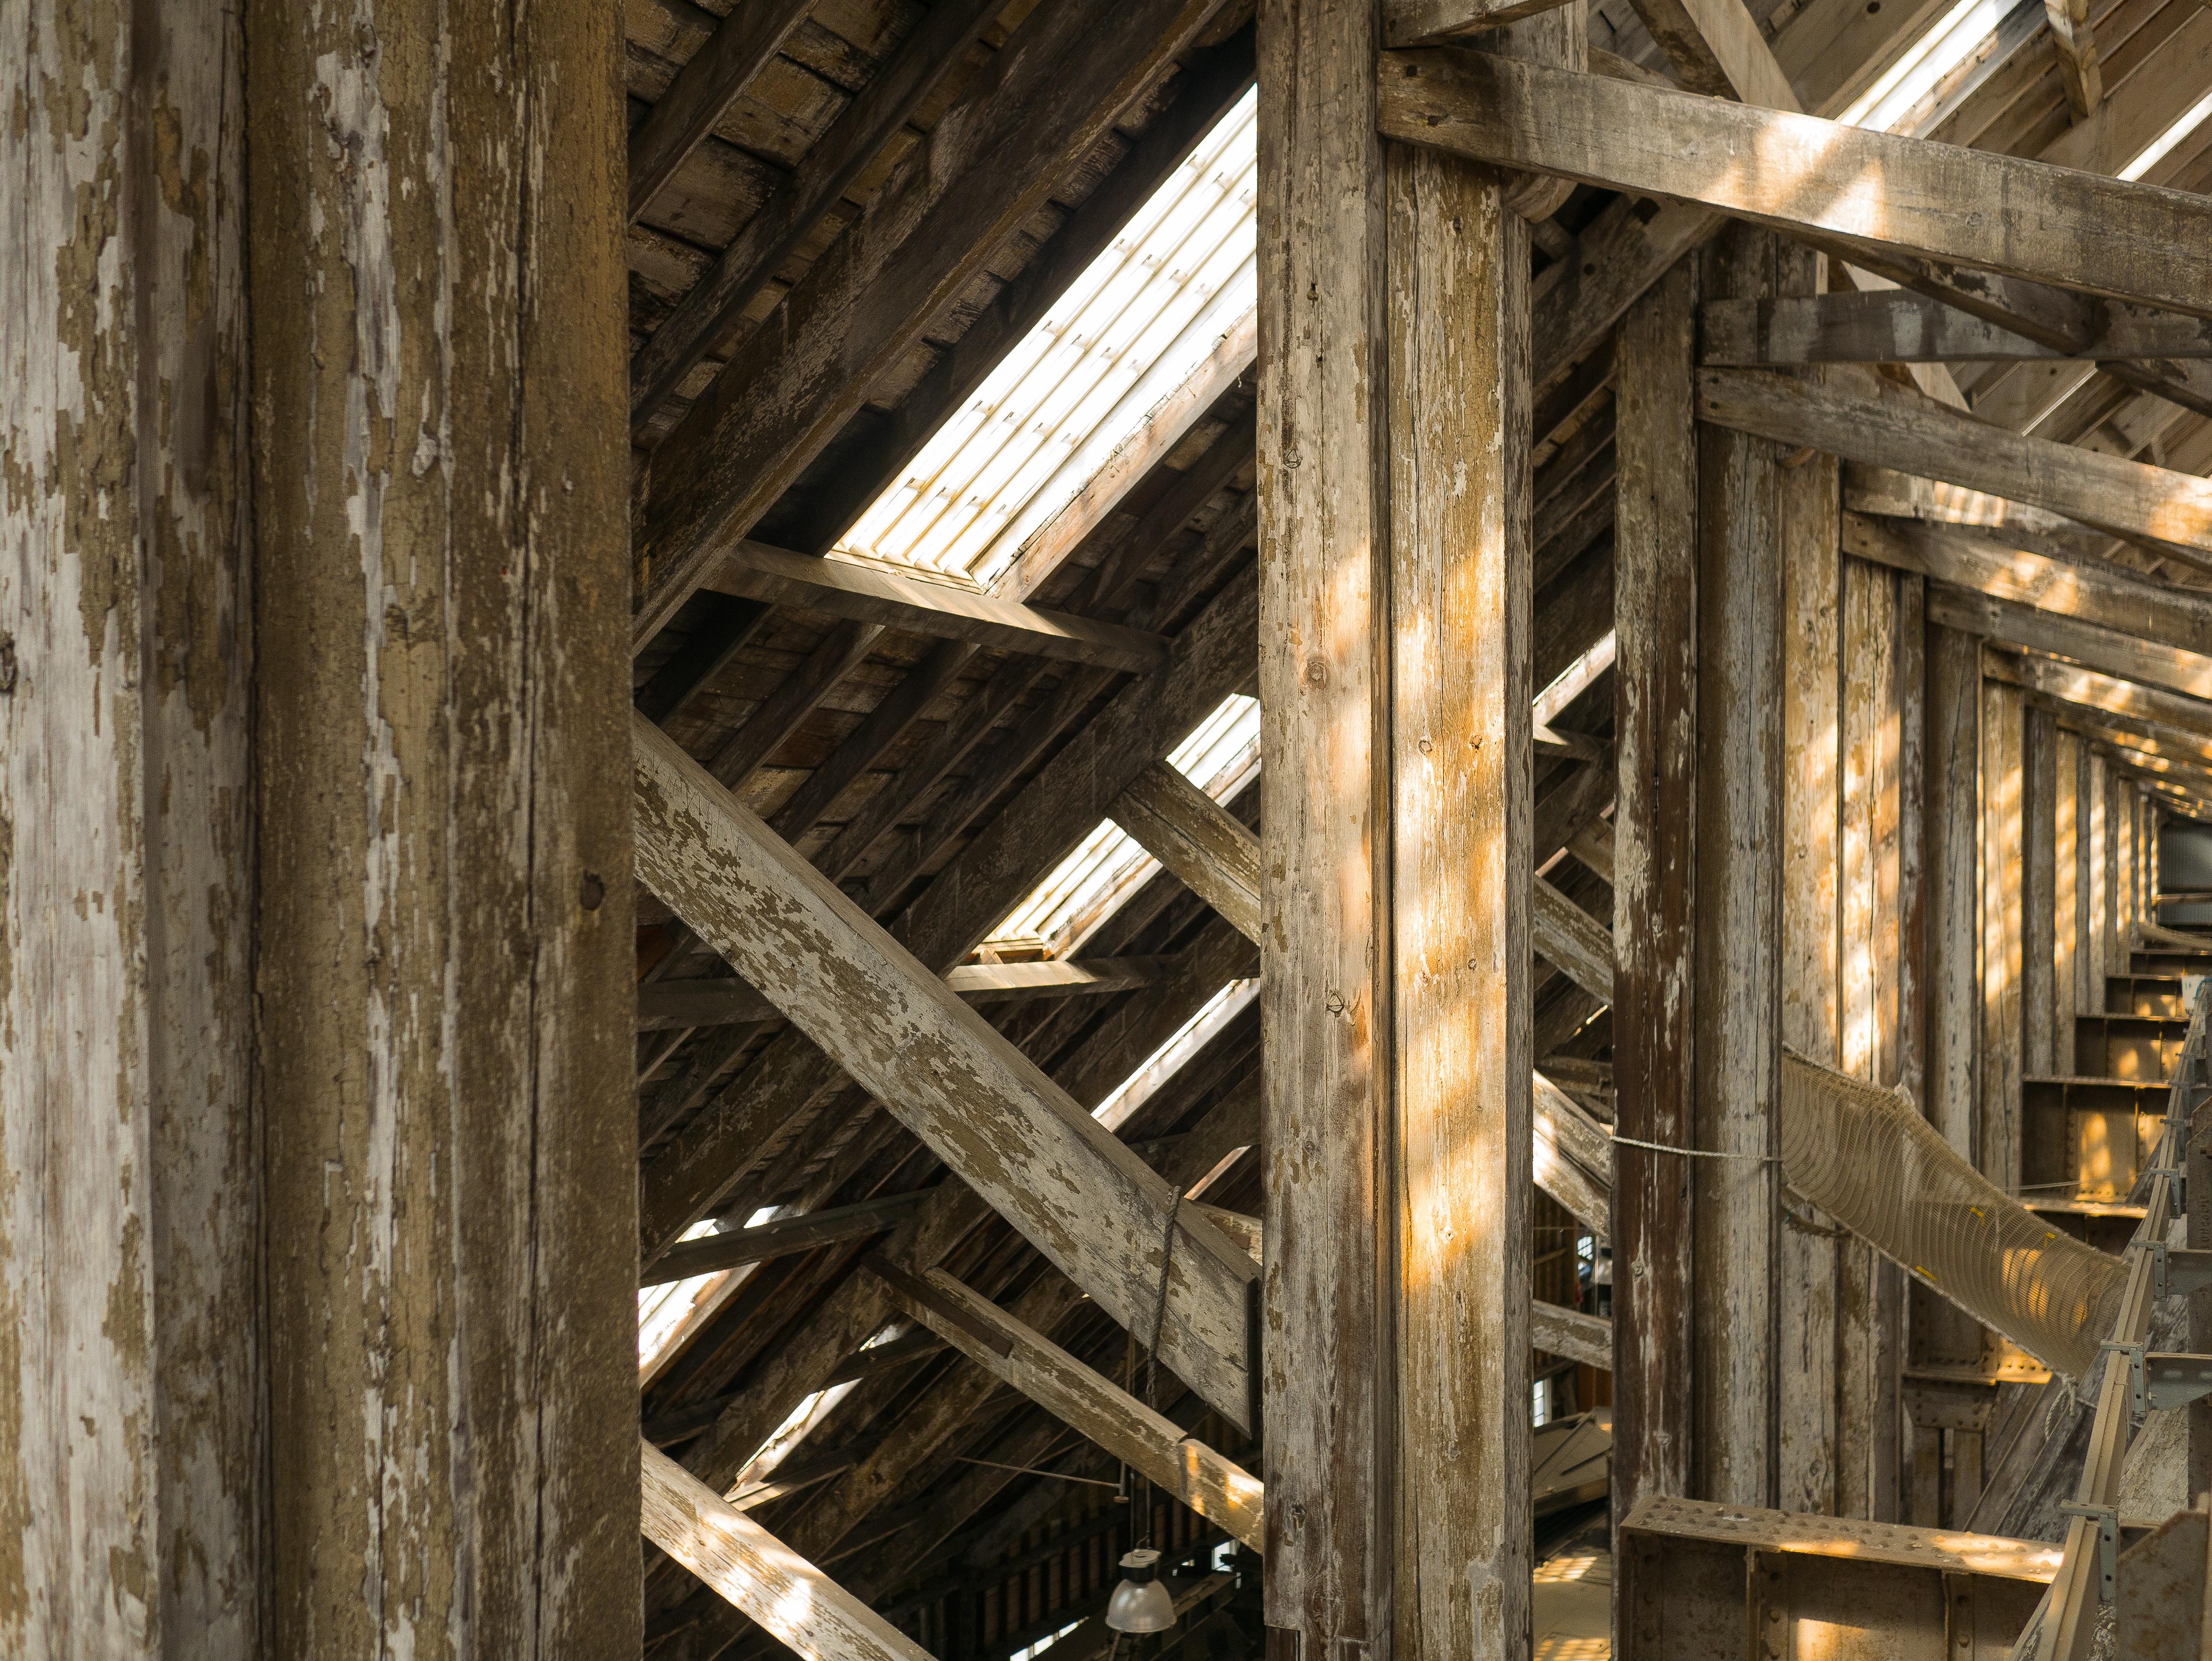 Gratis afbeeldingen : structuur hout dak schuur balk plafond